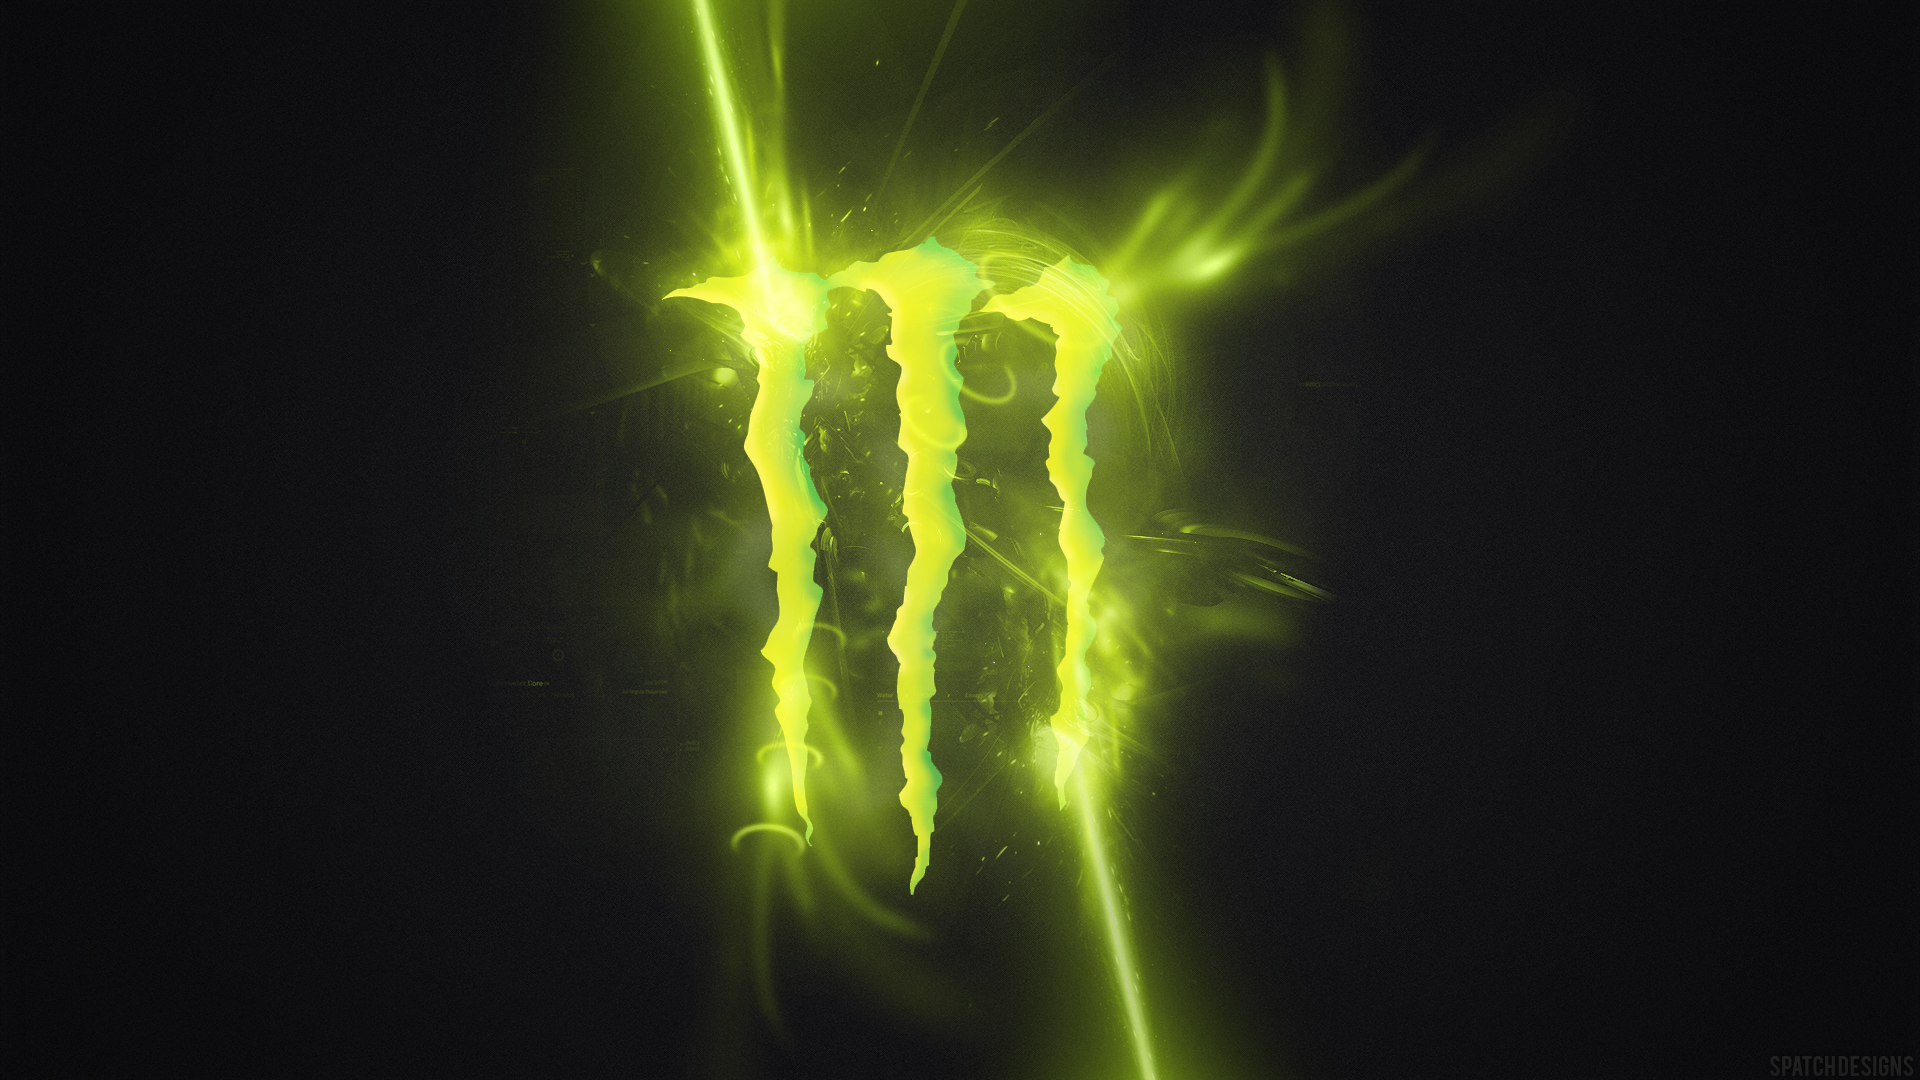 Beautiful Monster Energy Logo HD Wallpaper Picture Sharing Wallsev 1920x1080